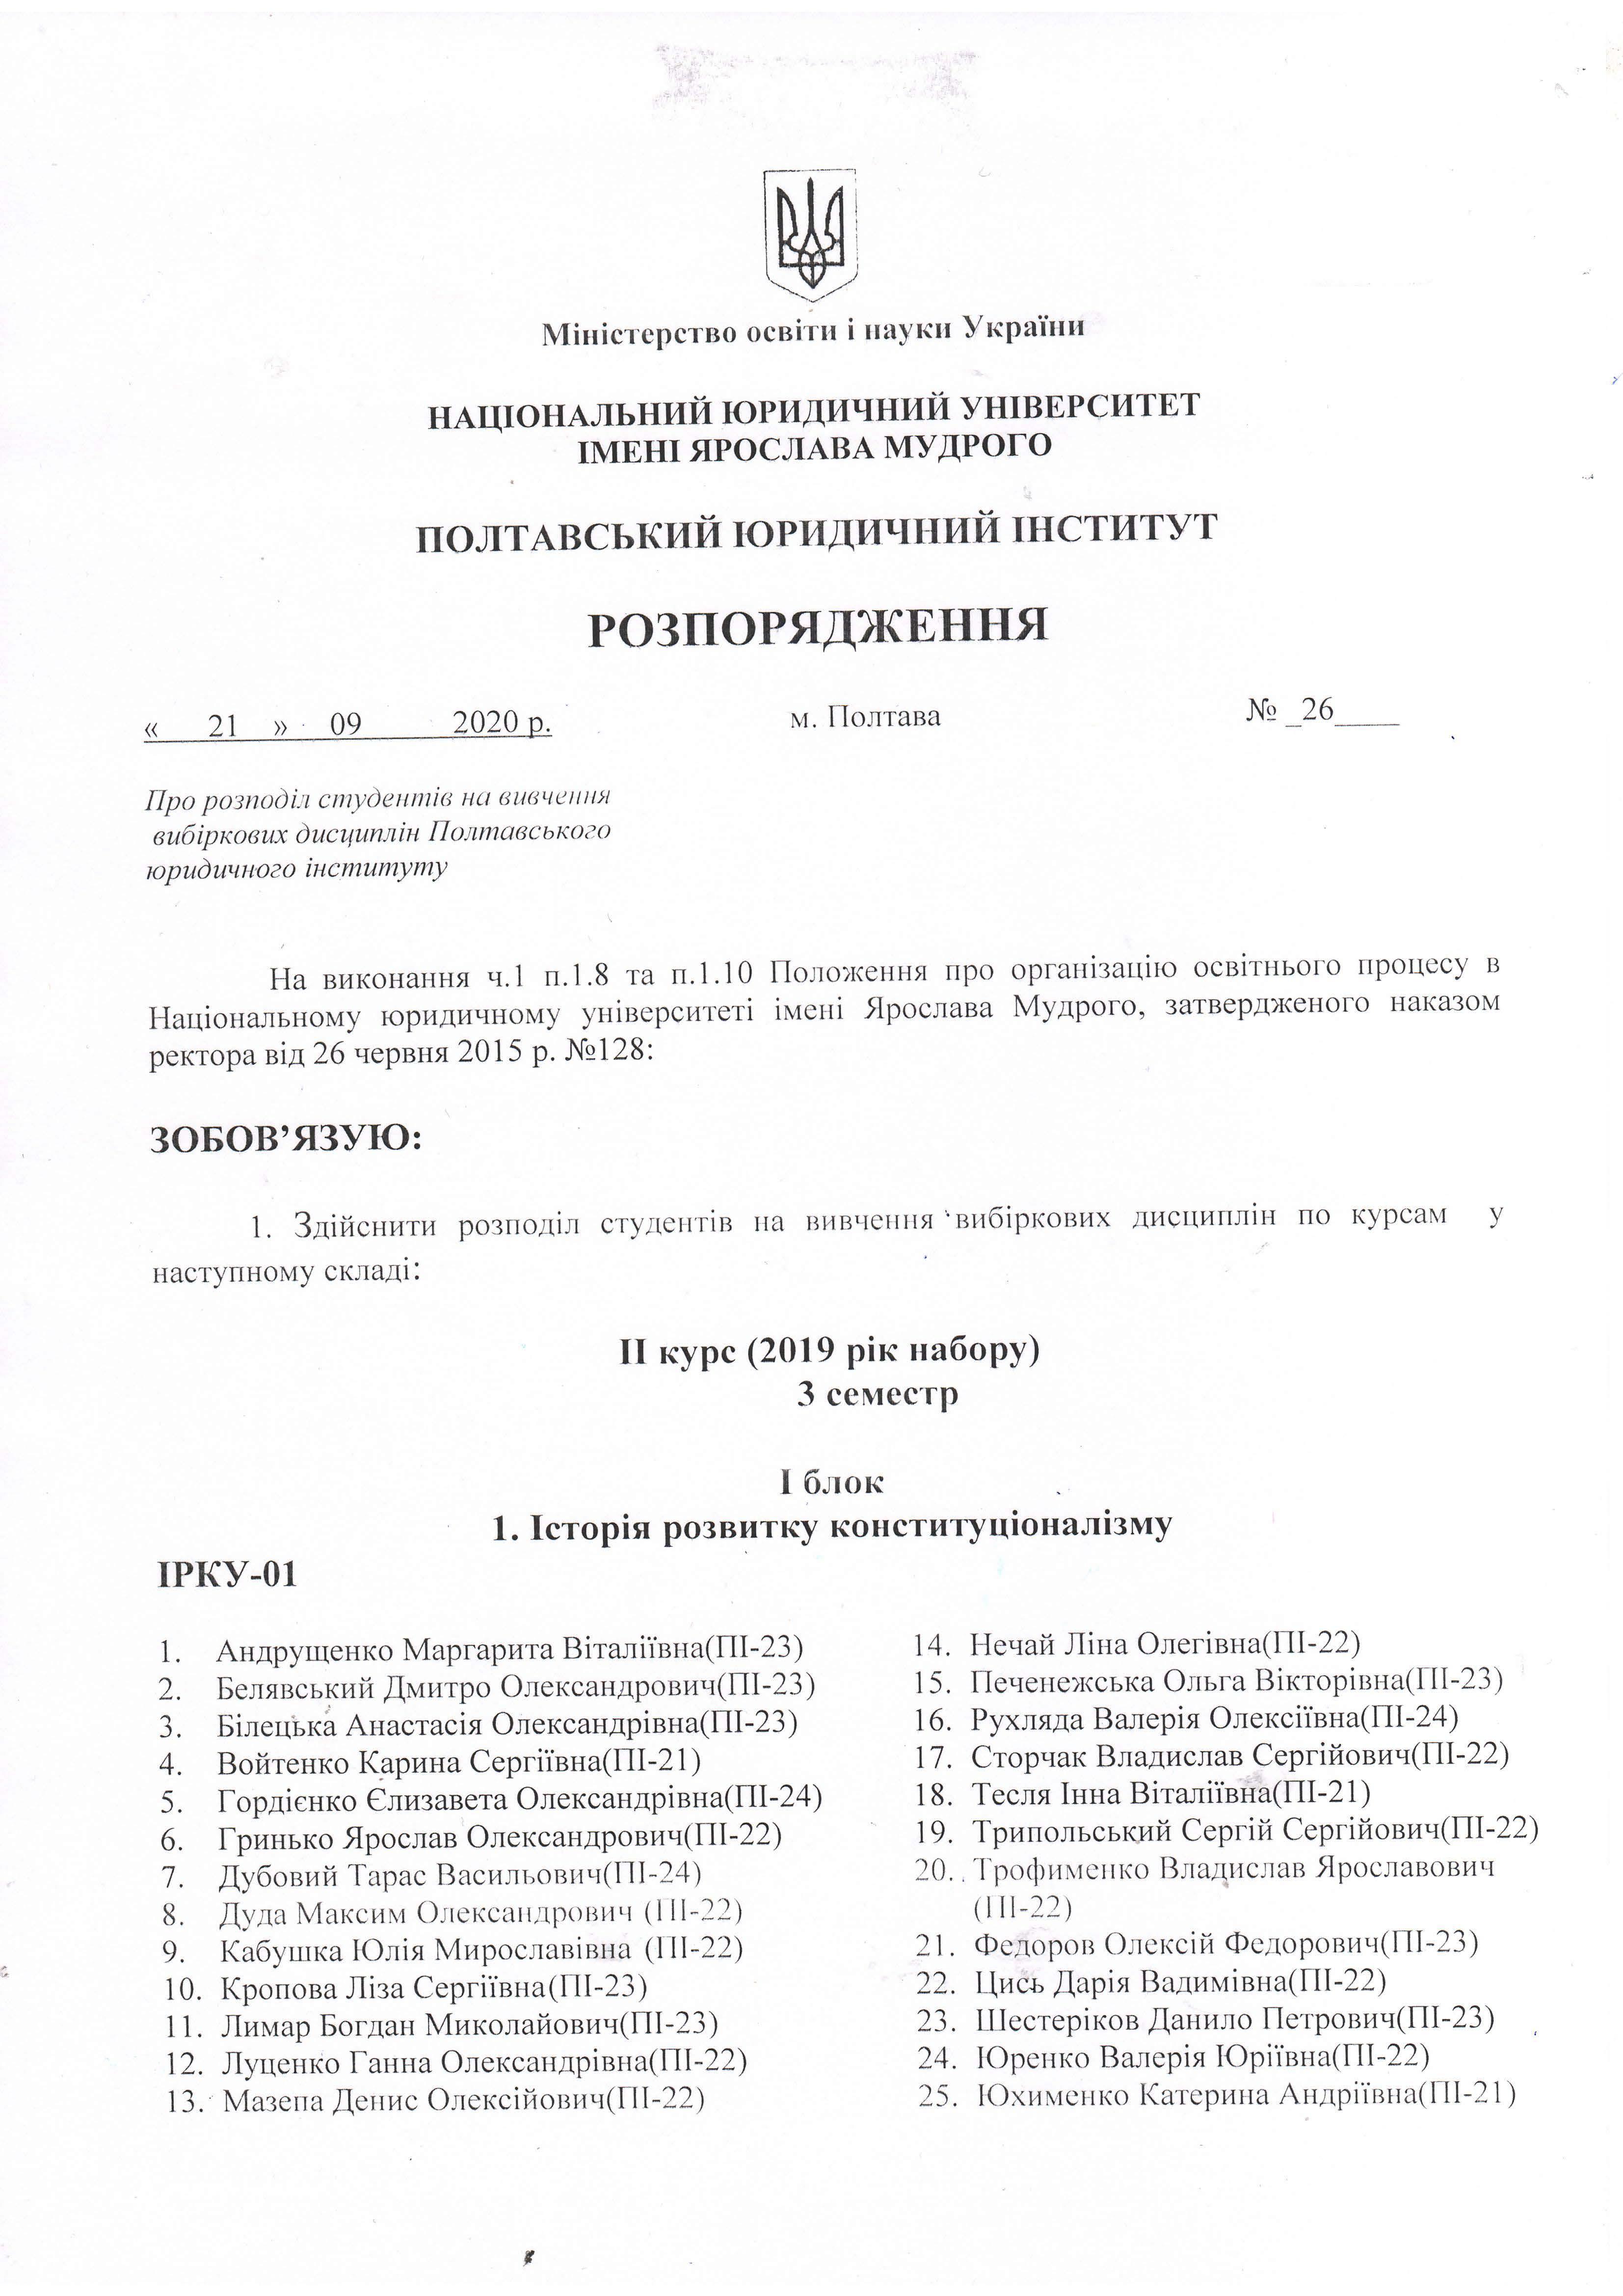 File0001_Страница_1